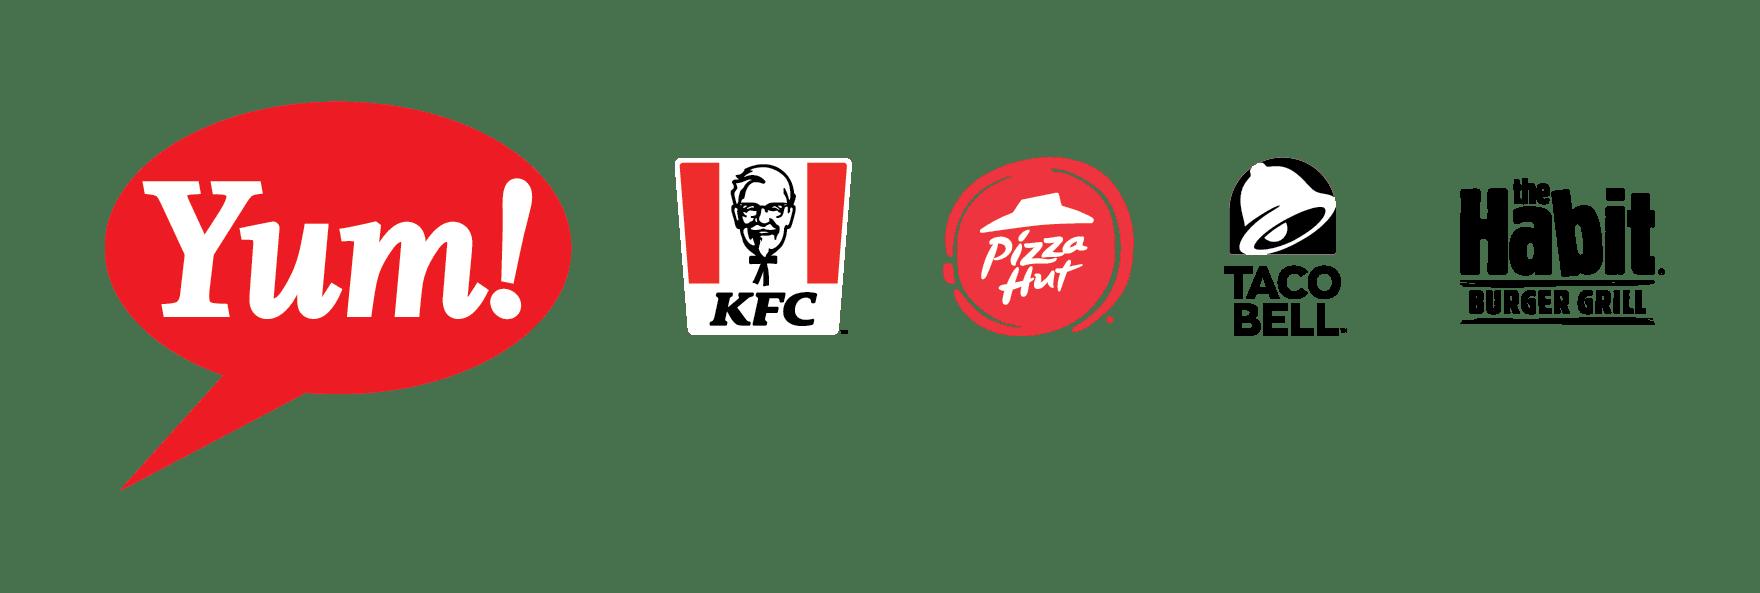 Yum! brand logos